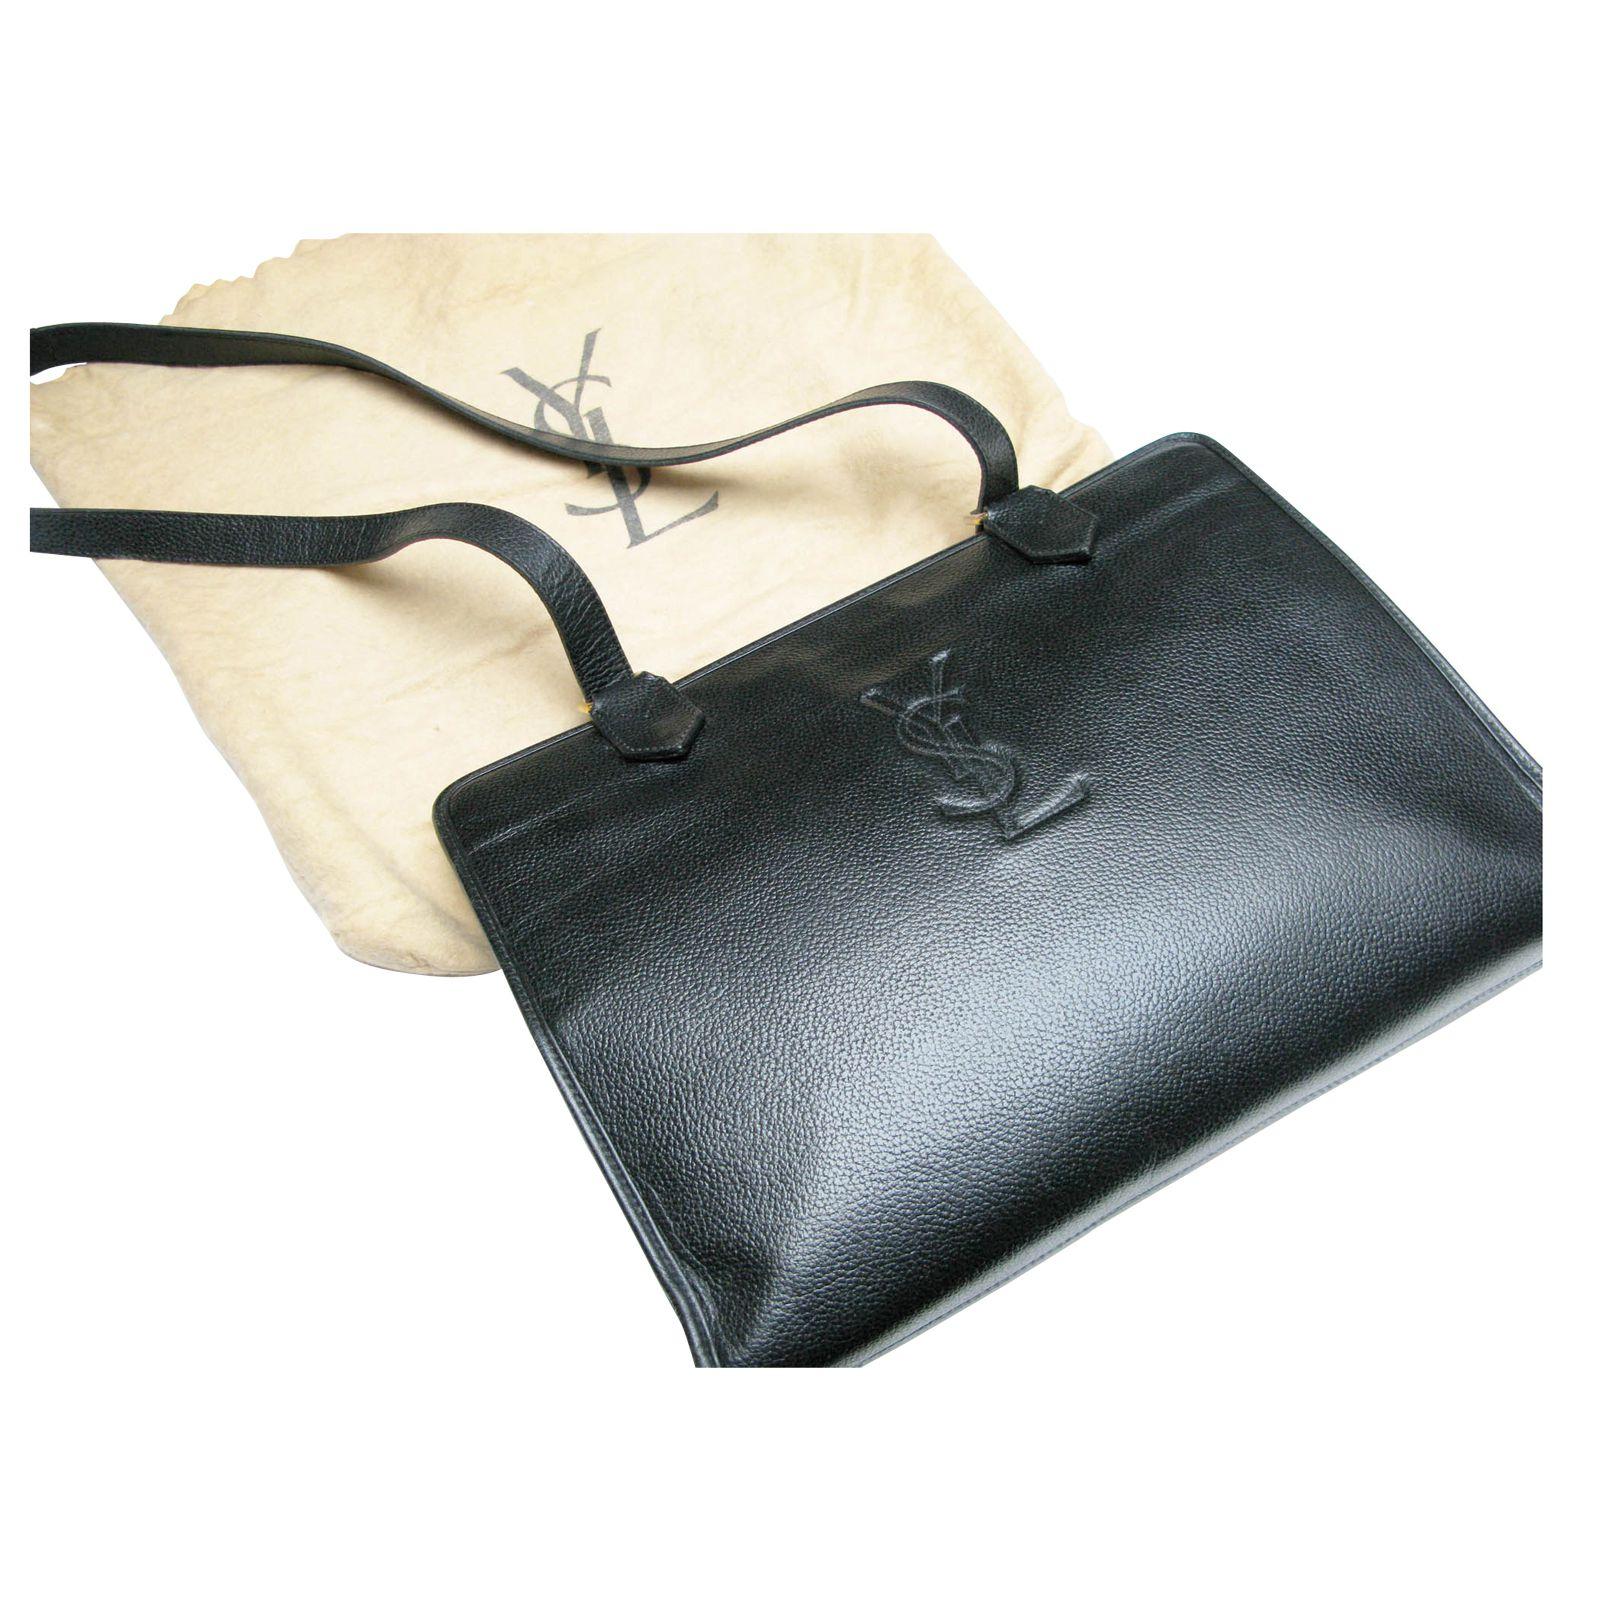 Yves Saint Laurent是世界著名的时尚前卫品牌,1962年创建于巴黎。Yves Saint Laurent旗舰产品是昂贵的高级时装,品牌产品中包括时装、香水、饰品、鞋帽、护肤化妆品及香烟等。伊夫圣罗兰先生 (Yves Saint Laurent) ,用巴黎左岸具创新、时尚的风情,开创了色彩缤纷、浪漫高雅的时代。伊夫圣罗兰 (Yves Saint Laurent) 弄潮时尚界,但从不媚俗,在探索新样式时总是将立足点放在传统精神的继承上,赋予高级时装的时代意义,并变换服装风格,他从来只是一个传统